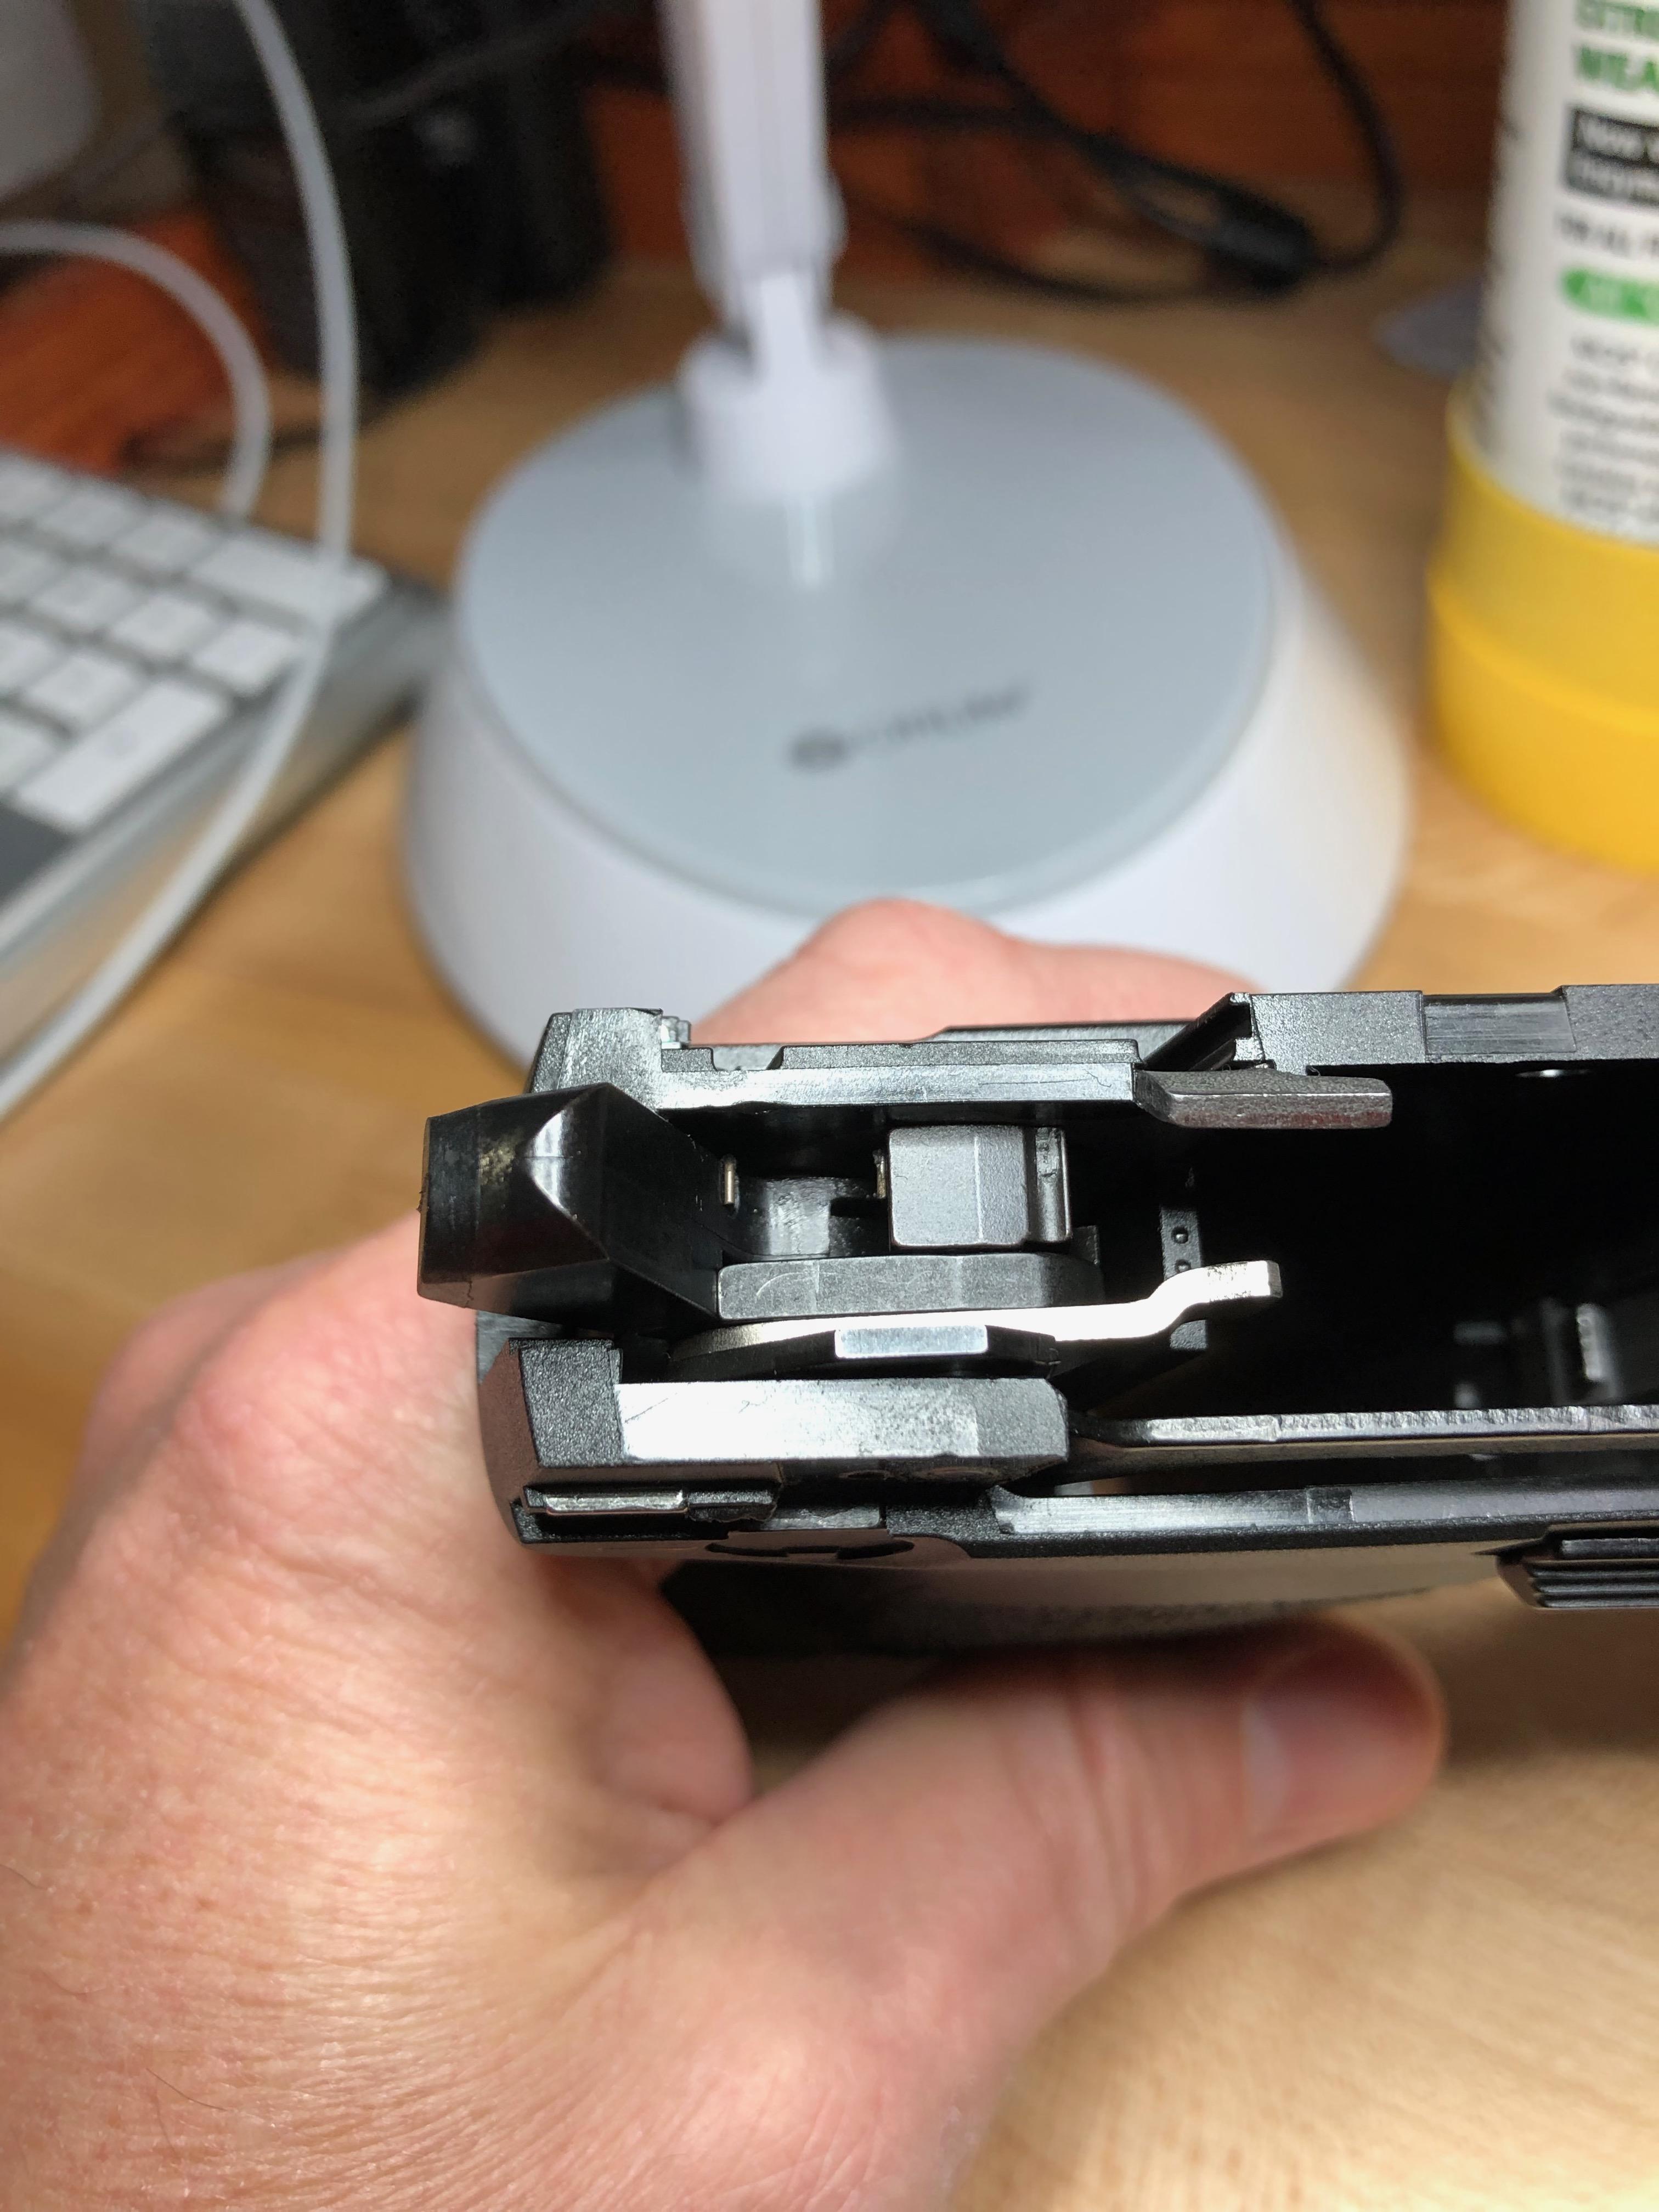 HK45 New LEM Install w/ Grayguns Short Reset Package - Doesn't Function-img_4046.jpg